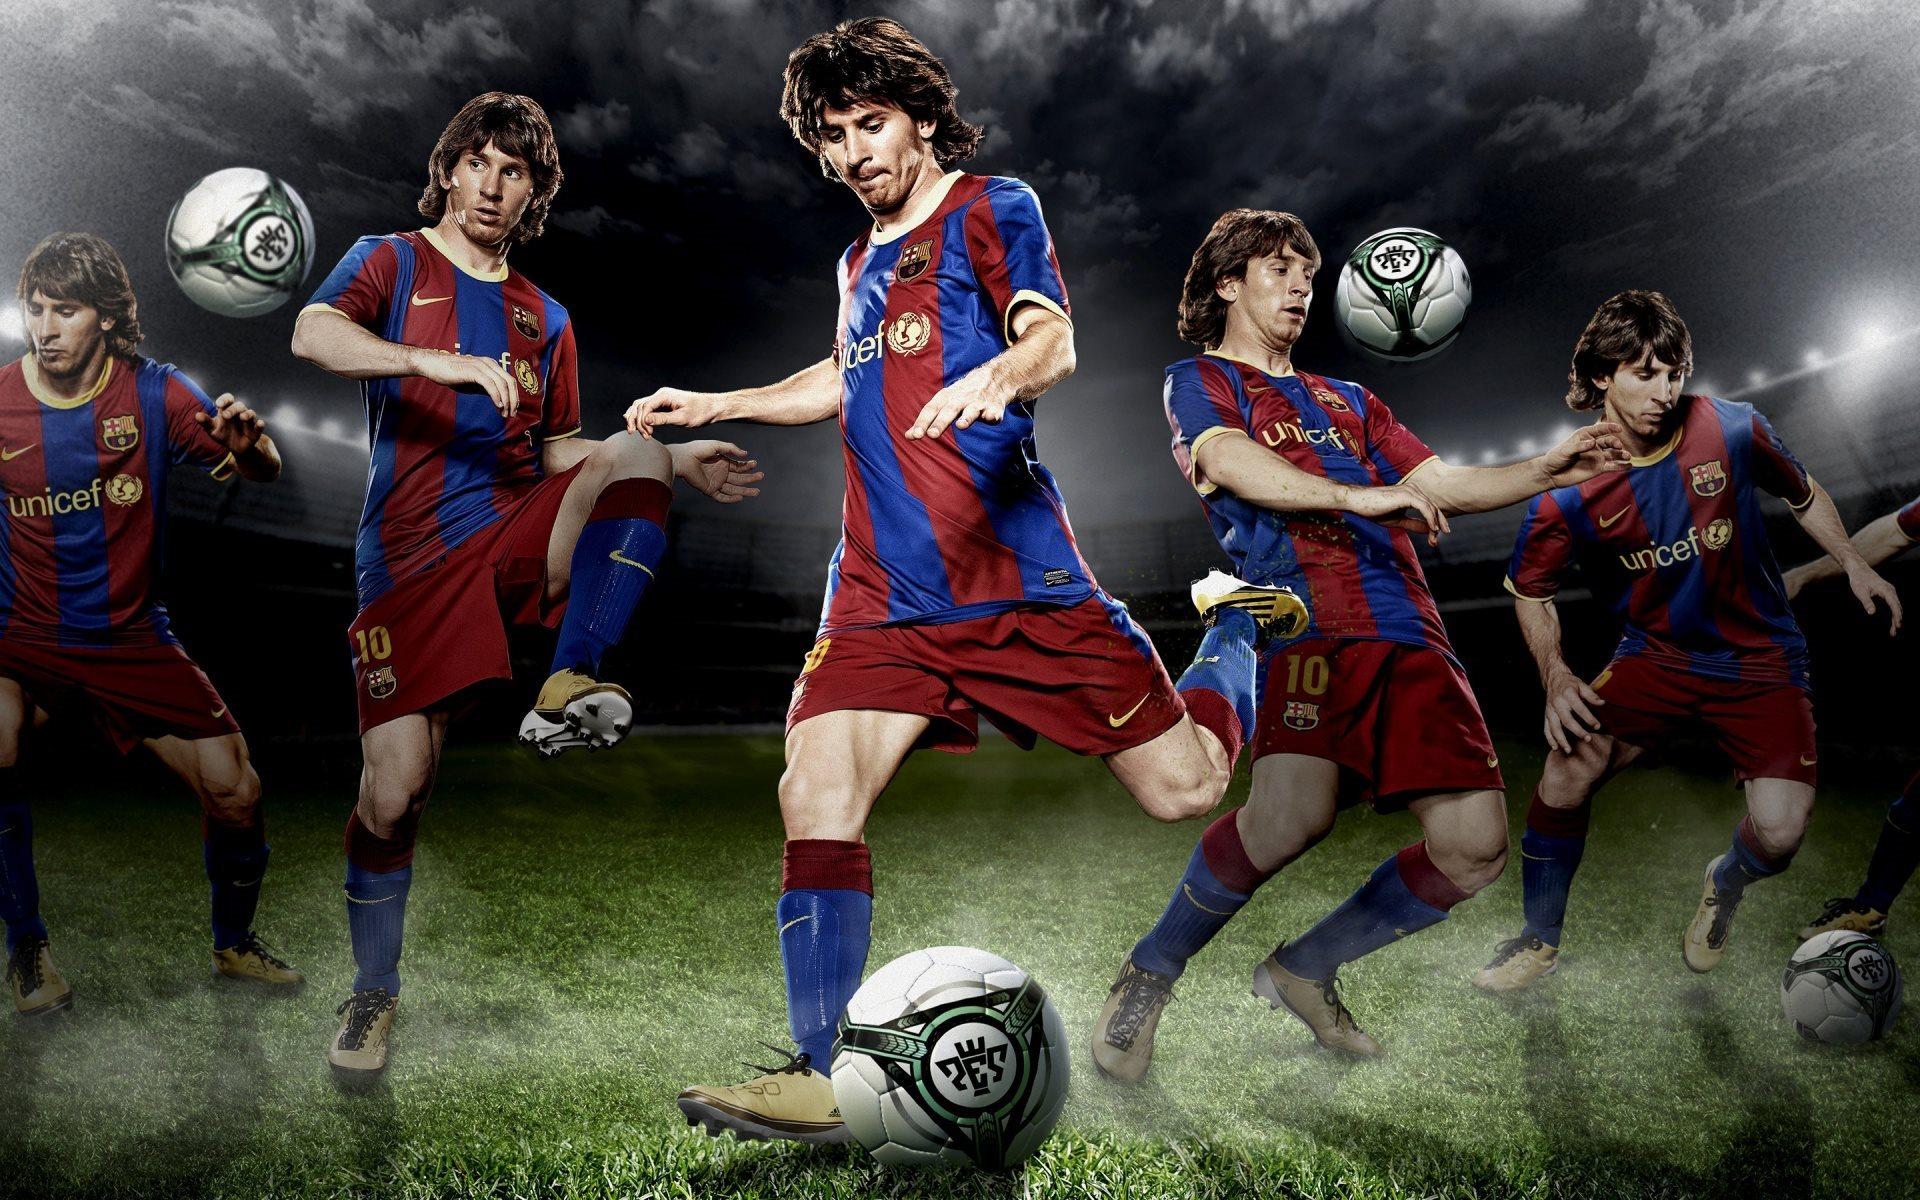 Lionel Messi Barca Fondo De Pantalla Hd Fondo De